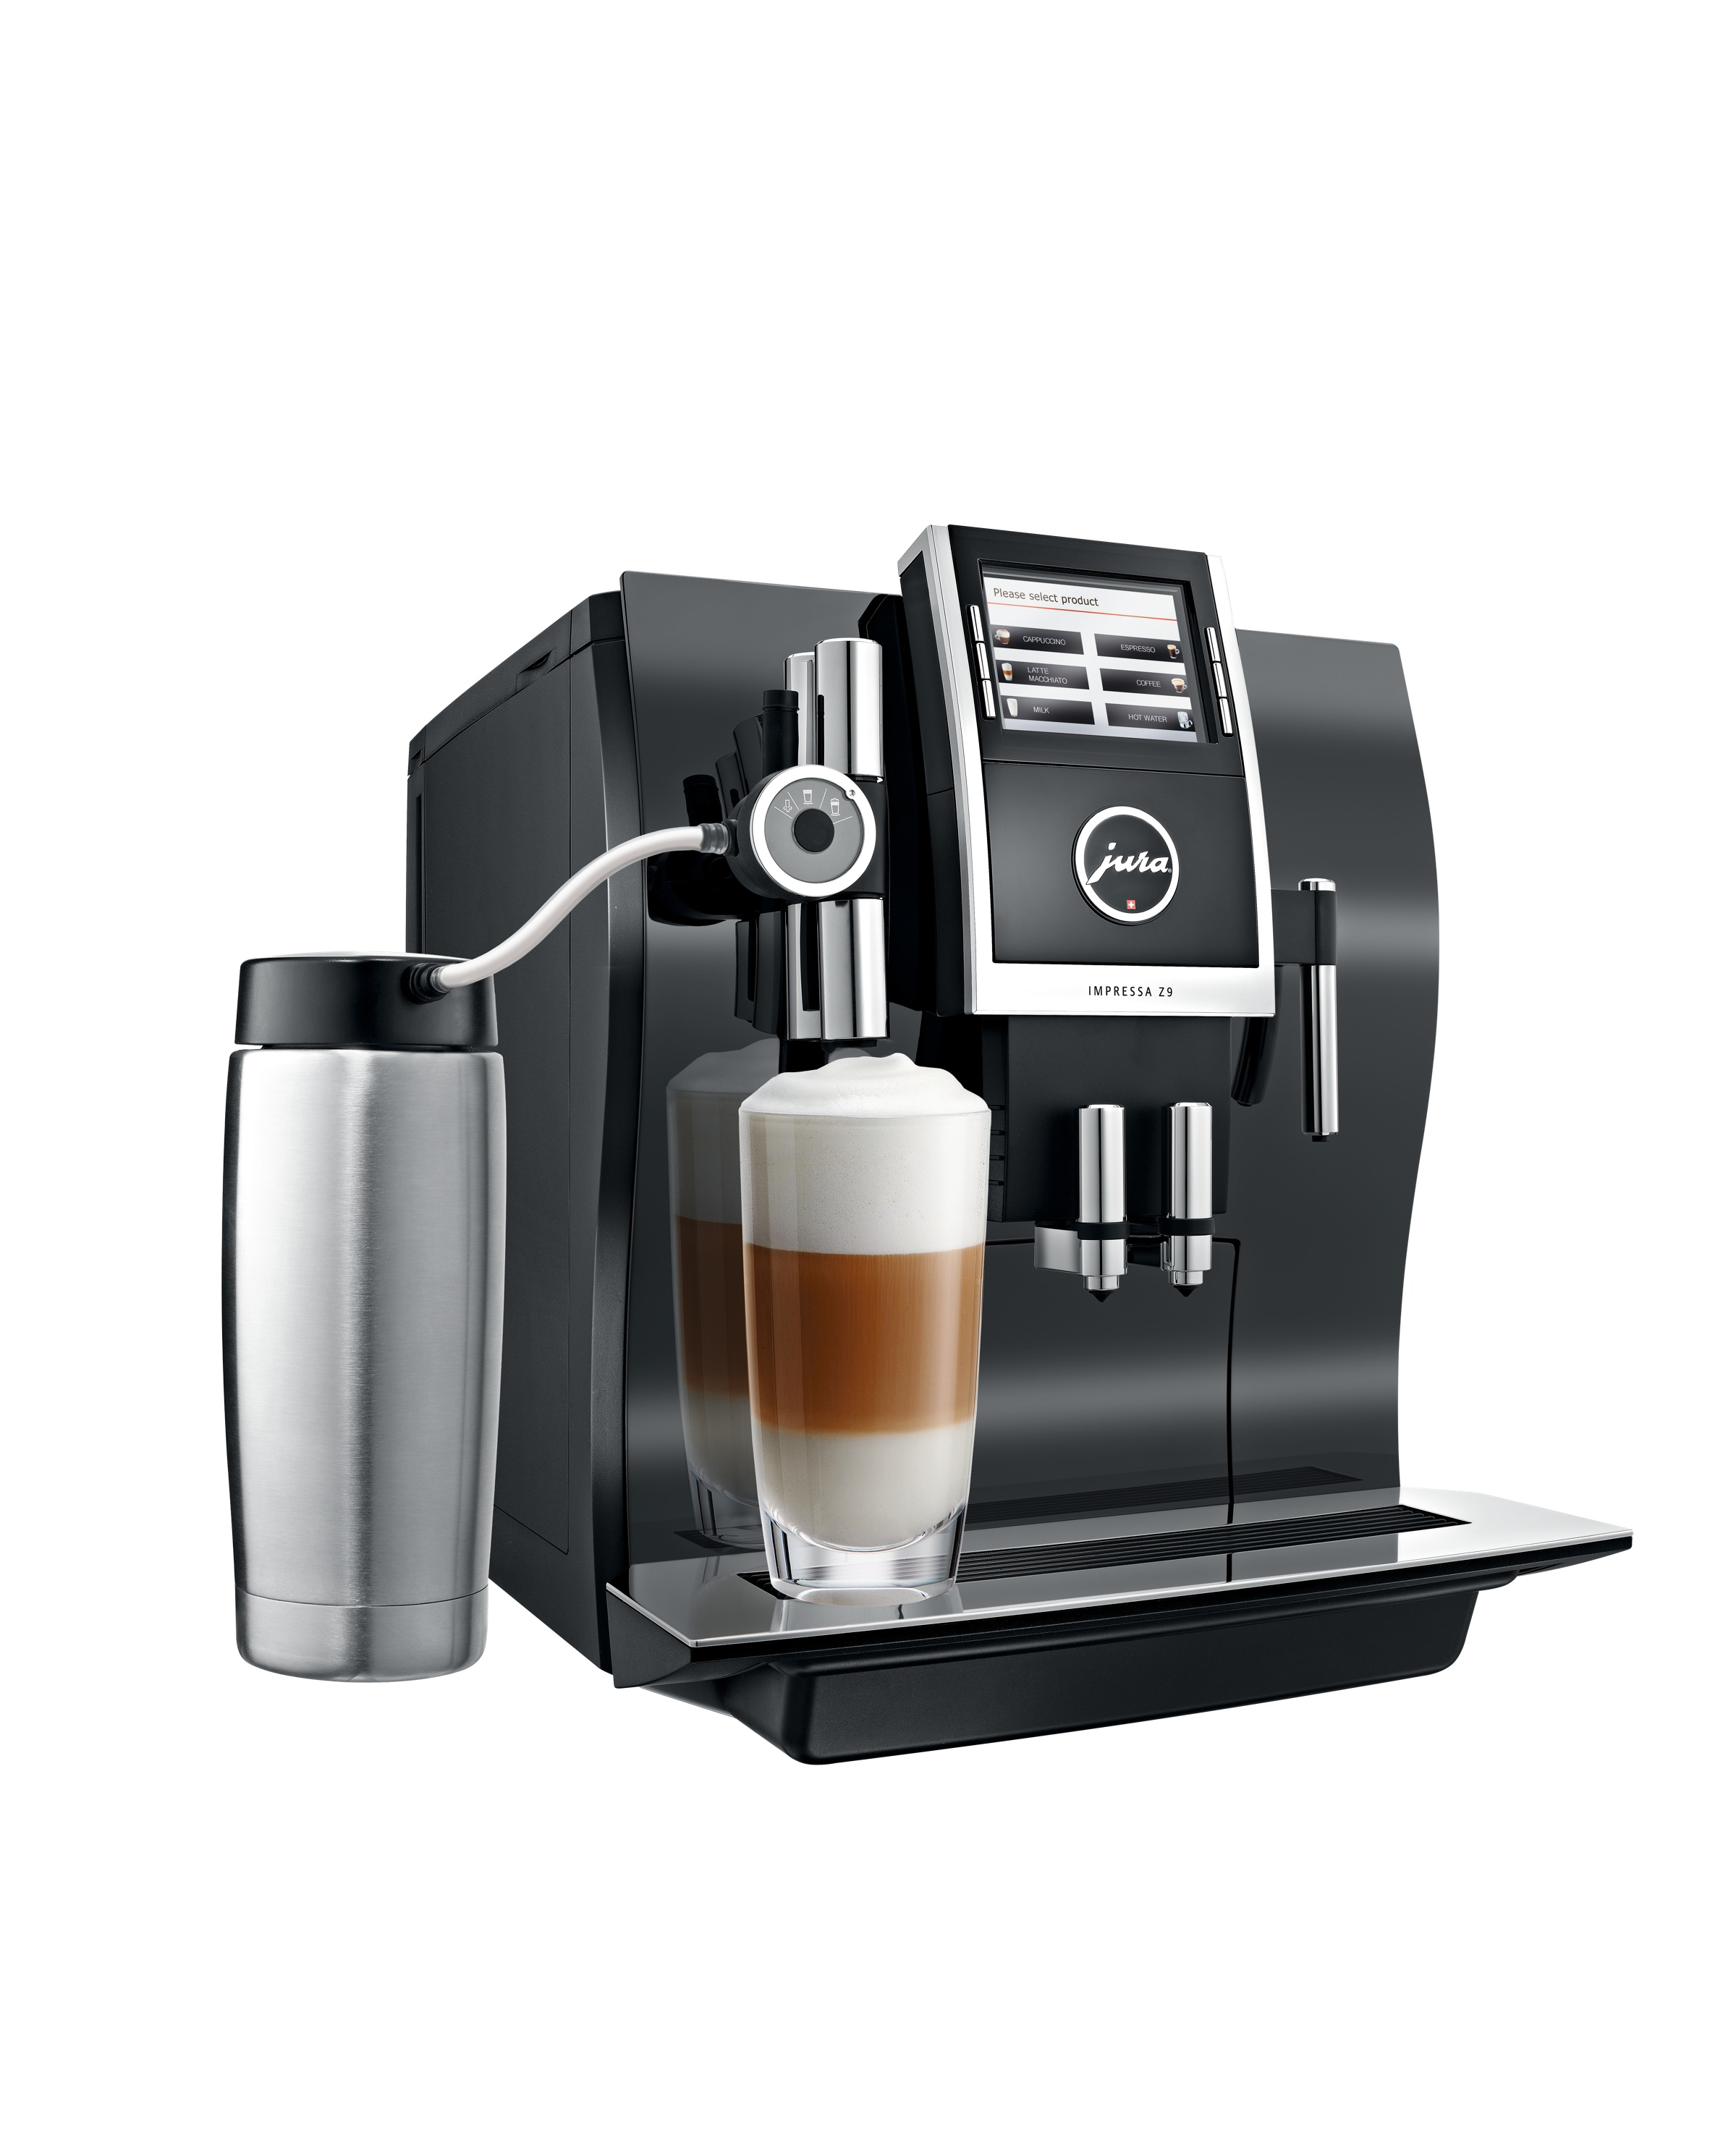 coffee-makers-registry-jura-impressa-z9-one-touch-0914.jpg